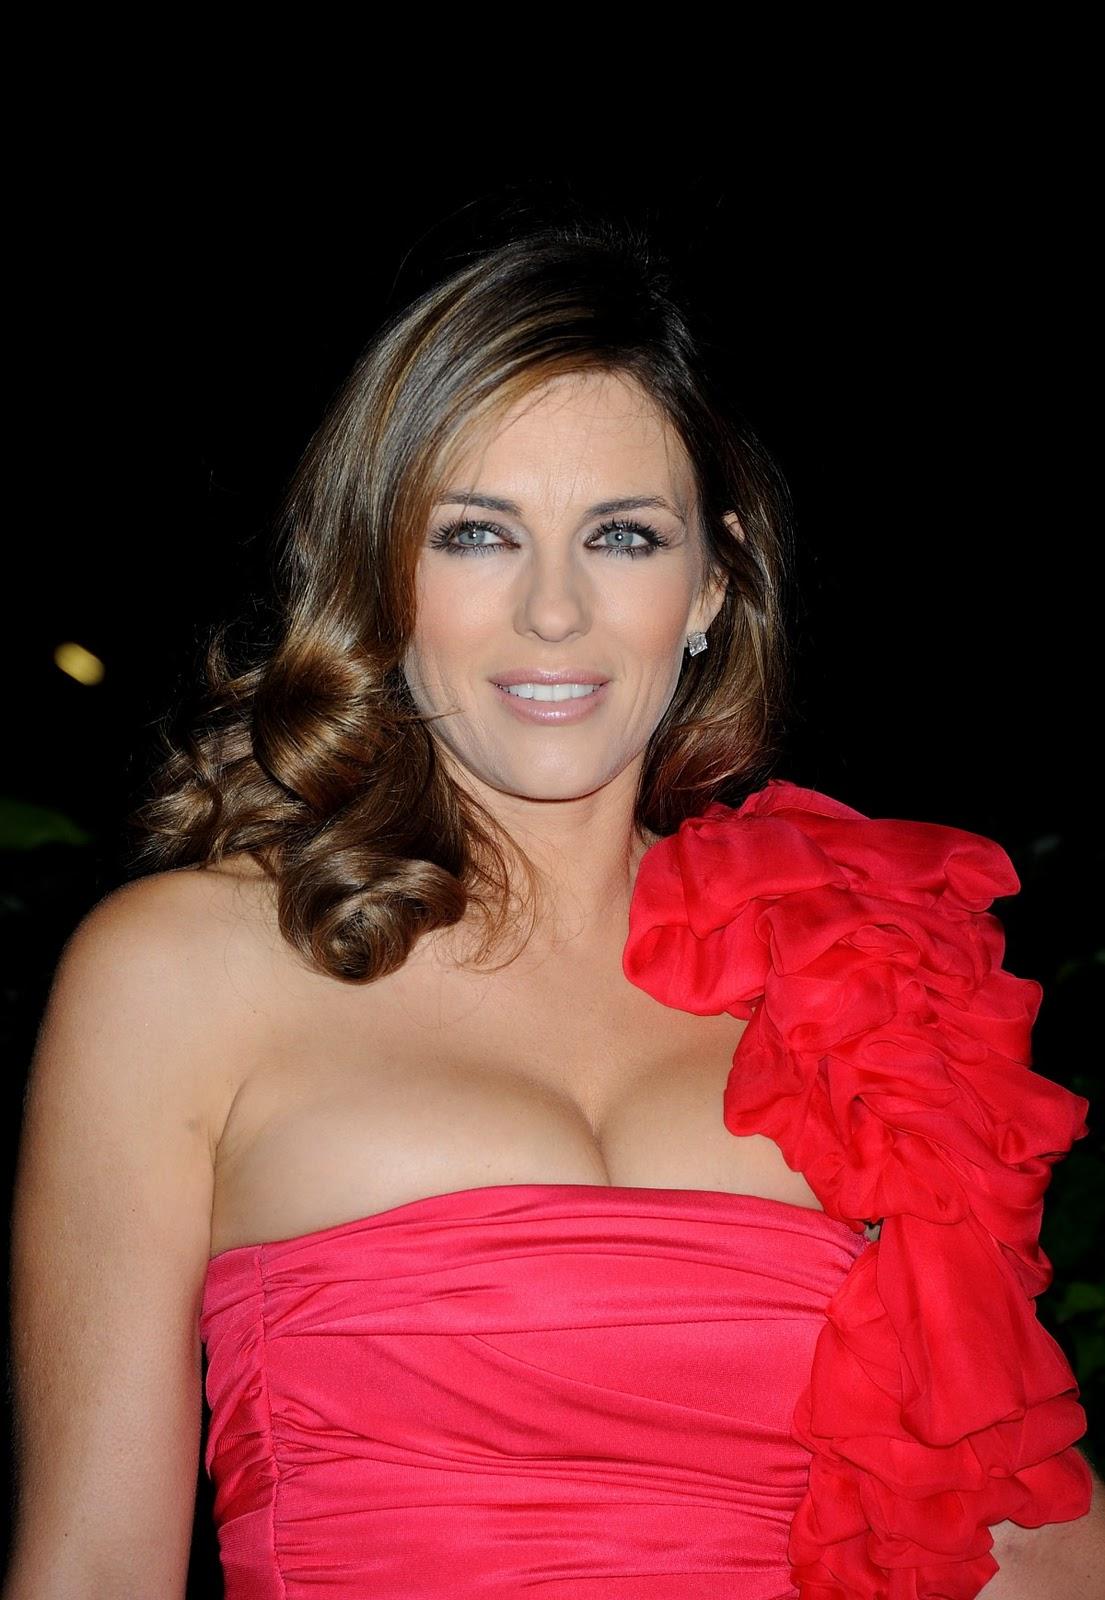 http://4.bp.blogspot.com/_WDCWEjl45FQ/TPqta7TFmXI/AAAAAAAABQ8/gTmhtvE1gXY/s1600/elizabeth-hurley-cleavage-05.jpg